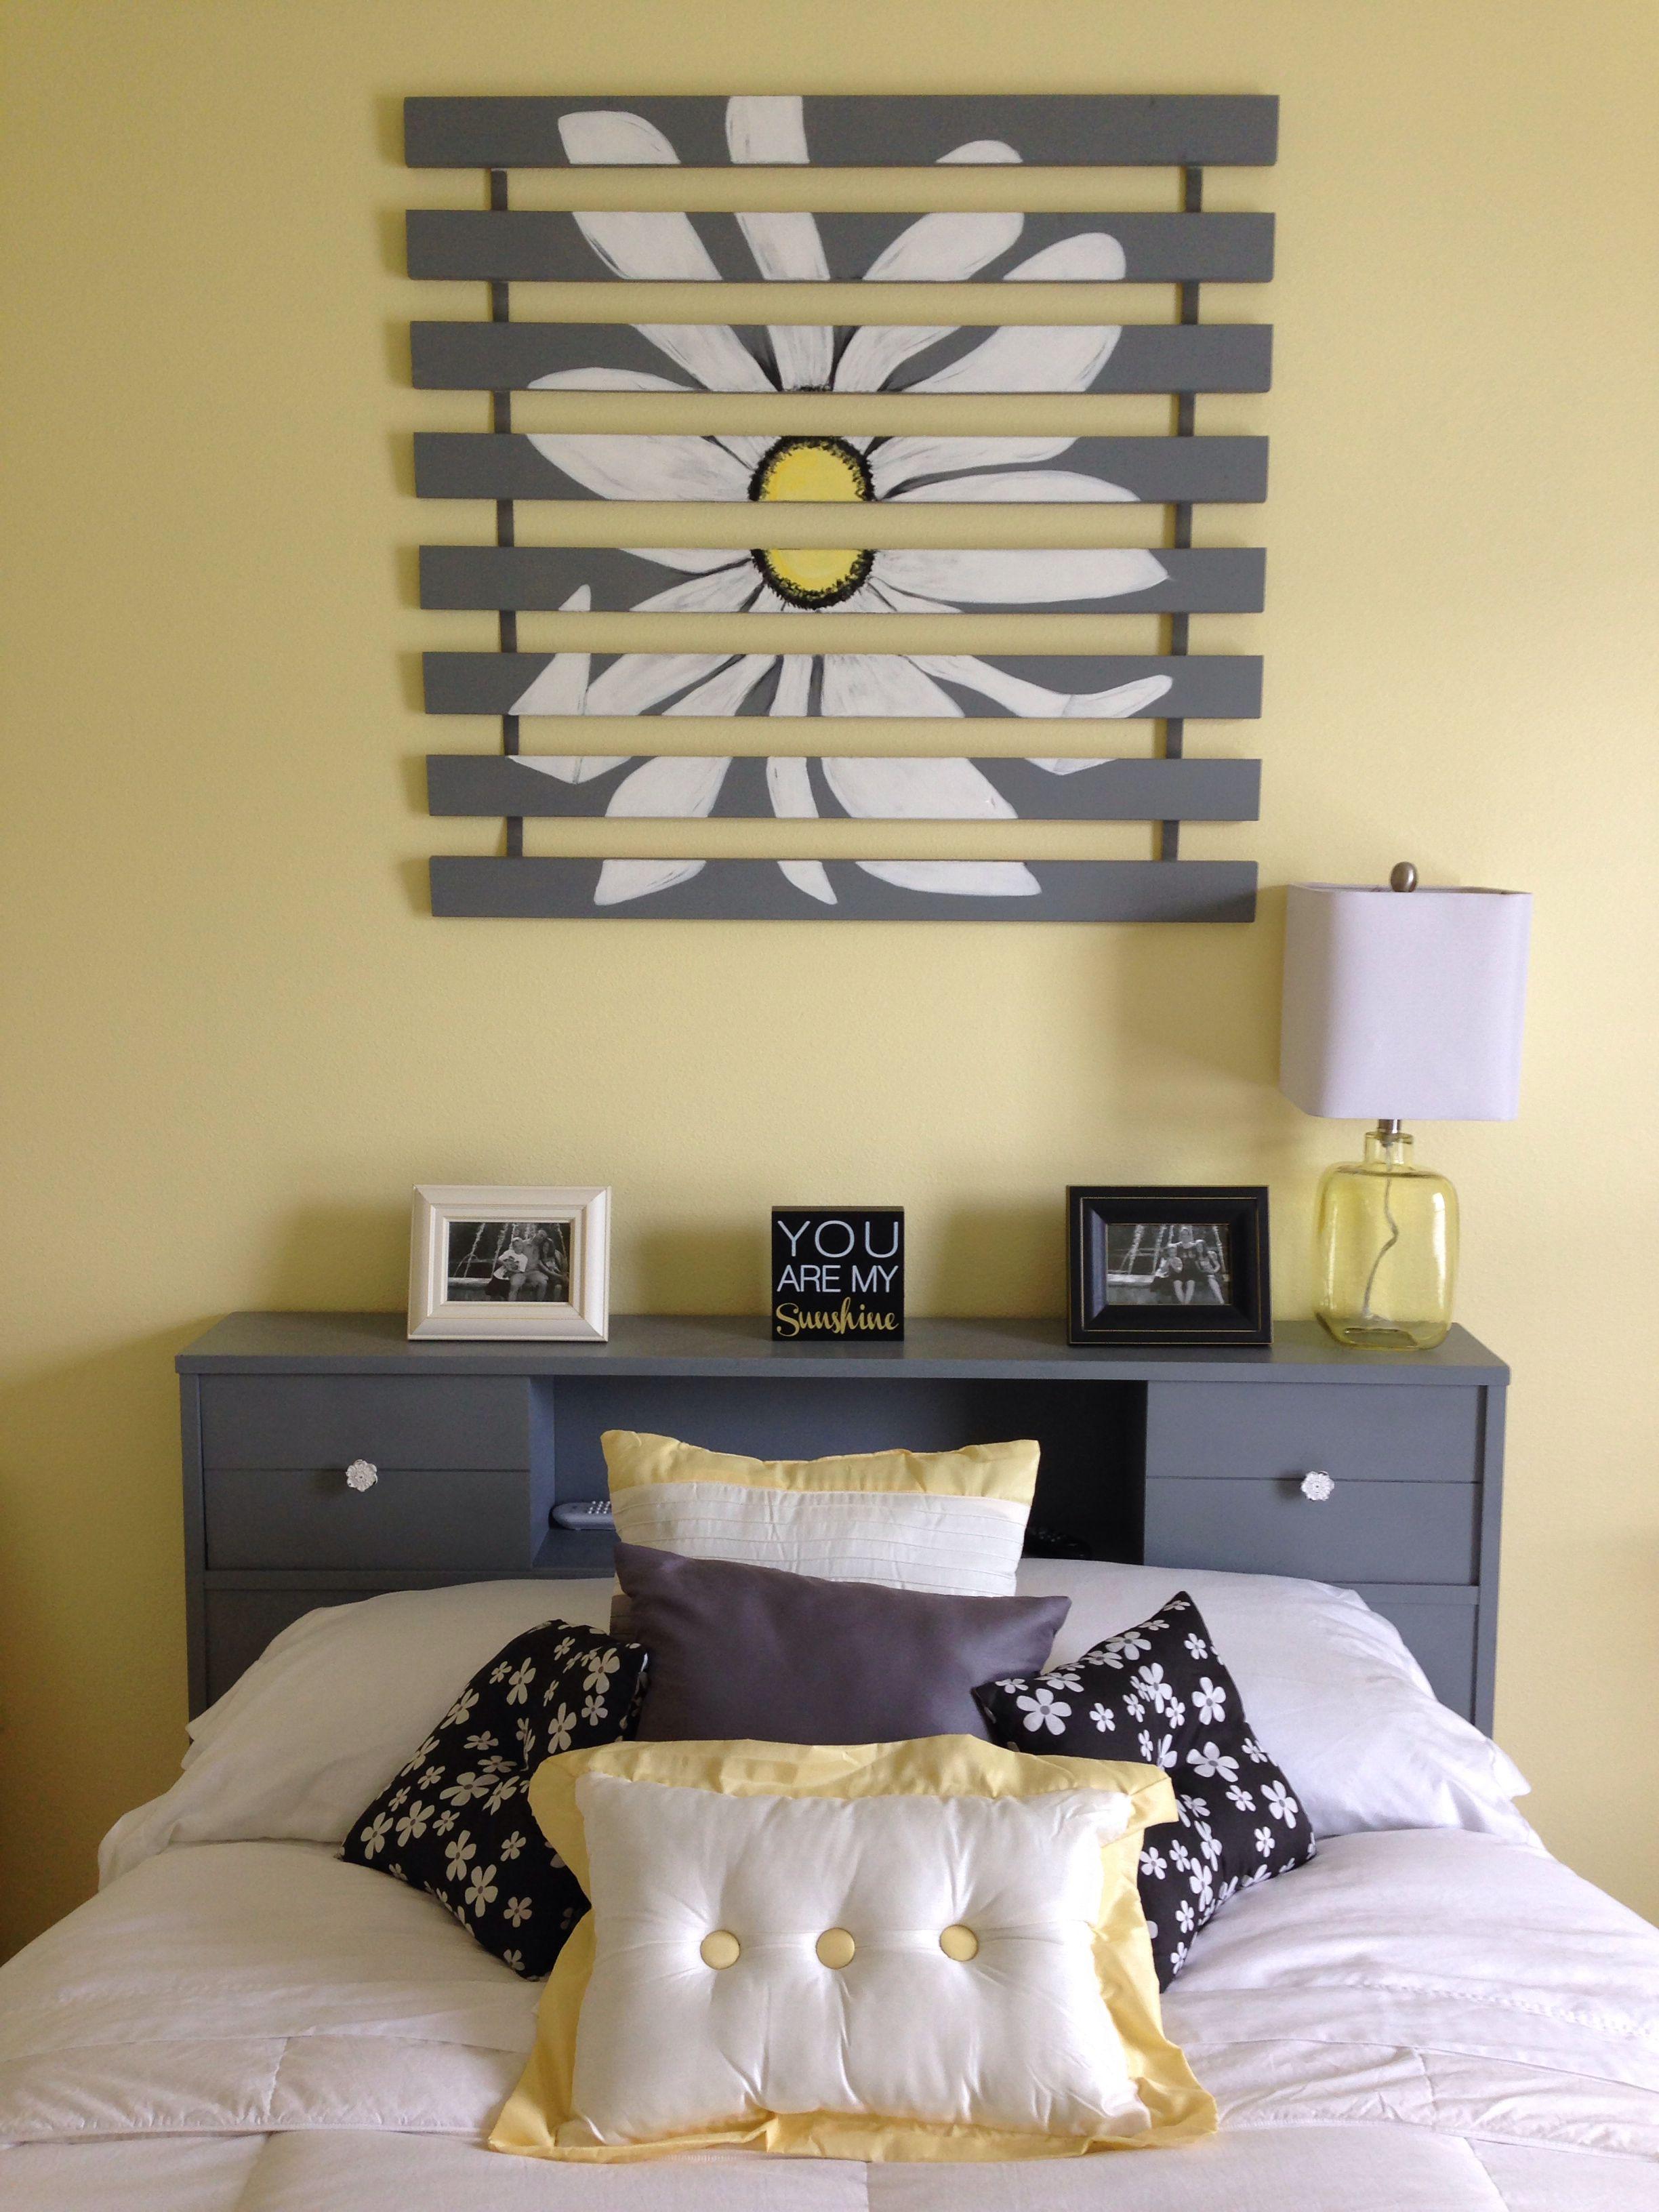 Ikea Bed Slats Recycled Ikea Bed Slats Bed Slats Upcycle Bed Slats